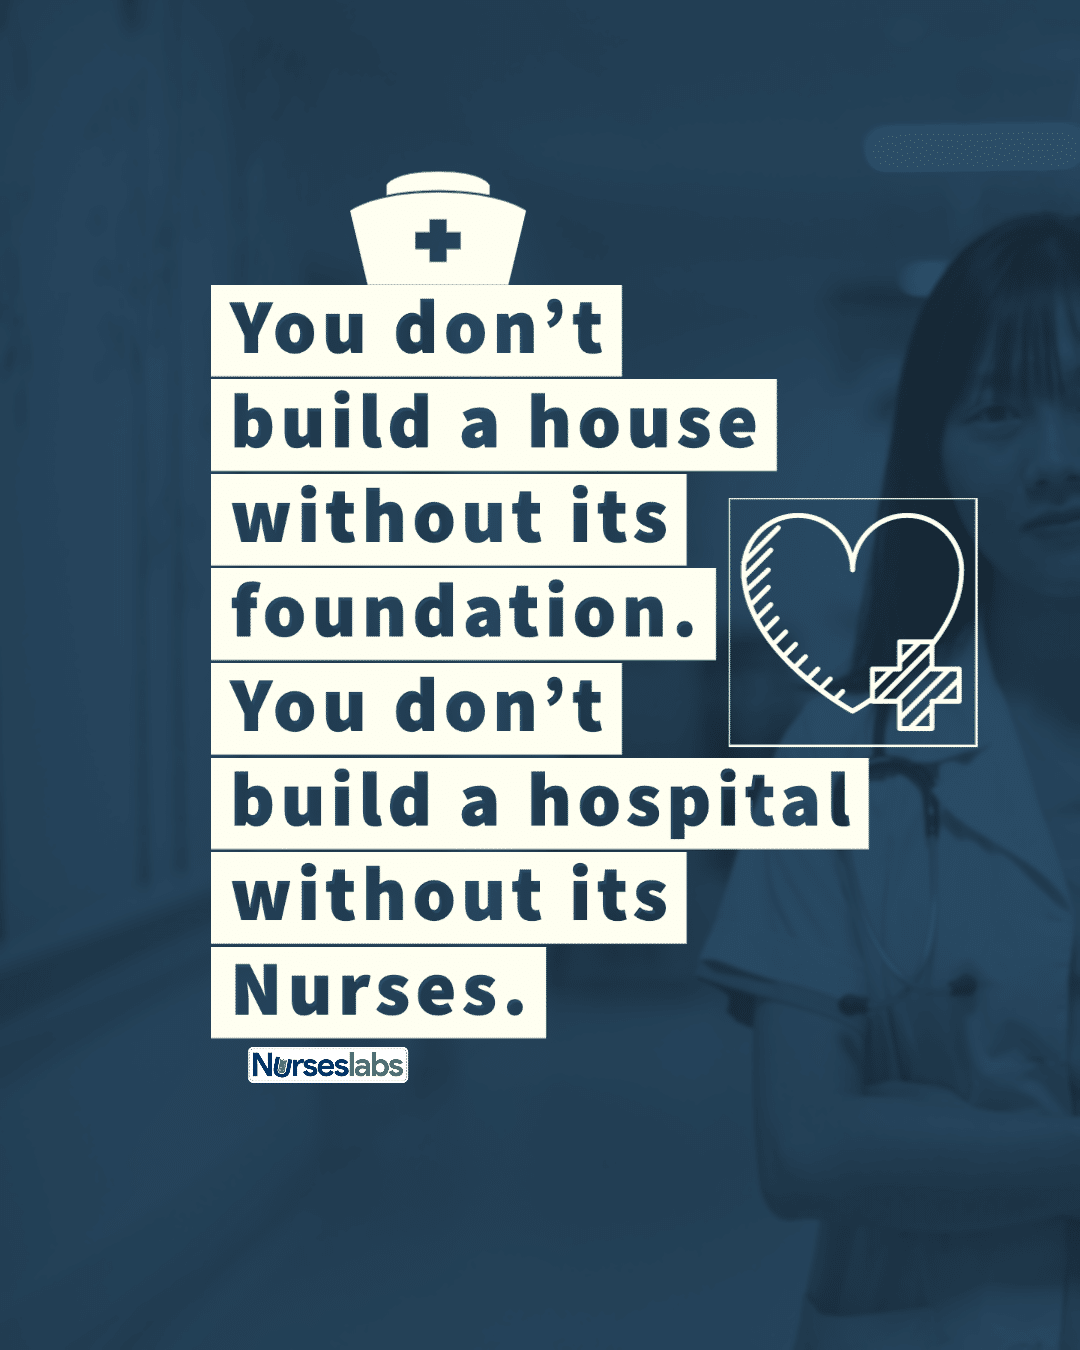 5 Nurse Quotes to Inspire, Motivate, and Humor Nurses - Nurseslabs